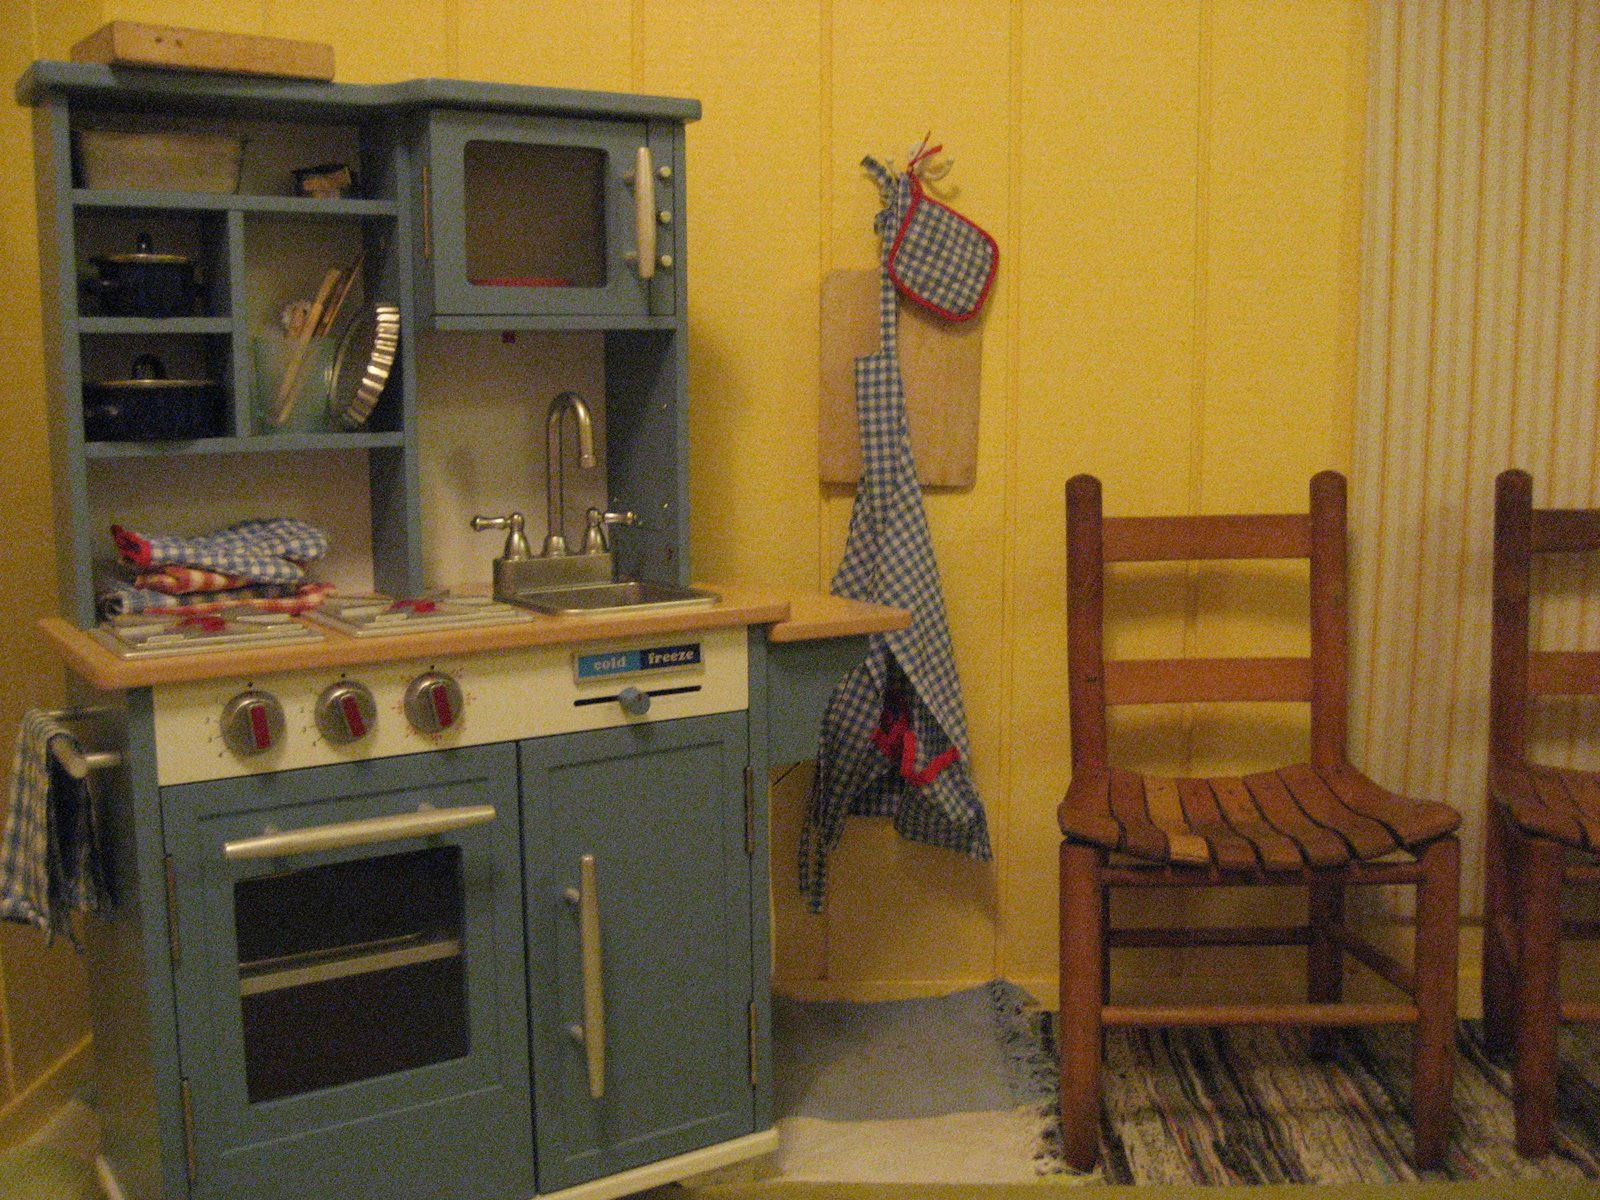 Wood Play Kitchen Set wooden kitchen playsets. kitchen inspiring pink square modern wood